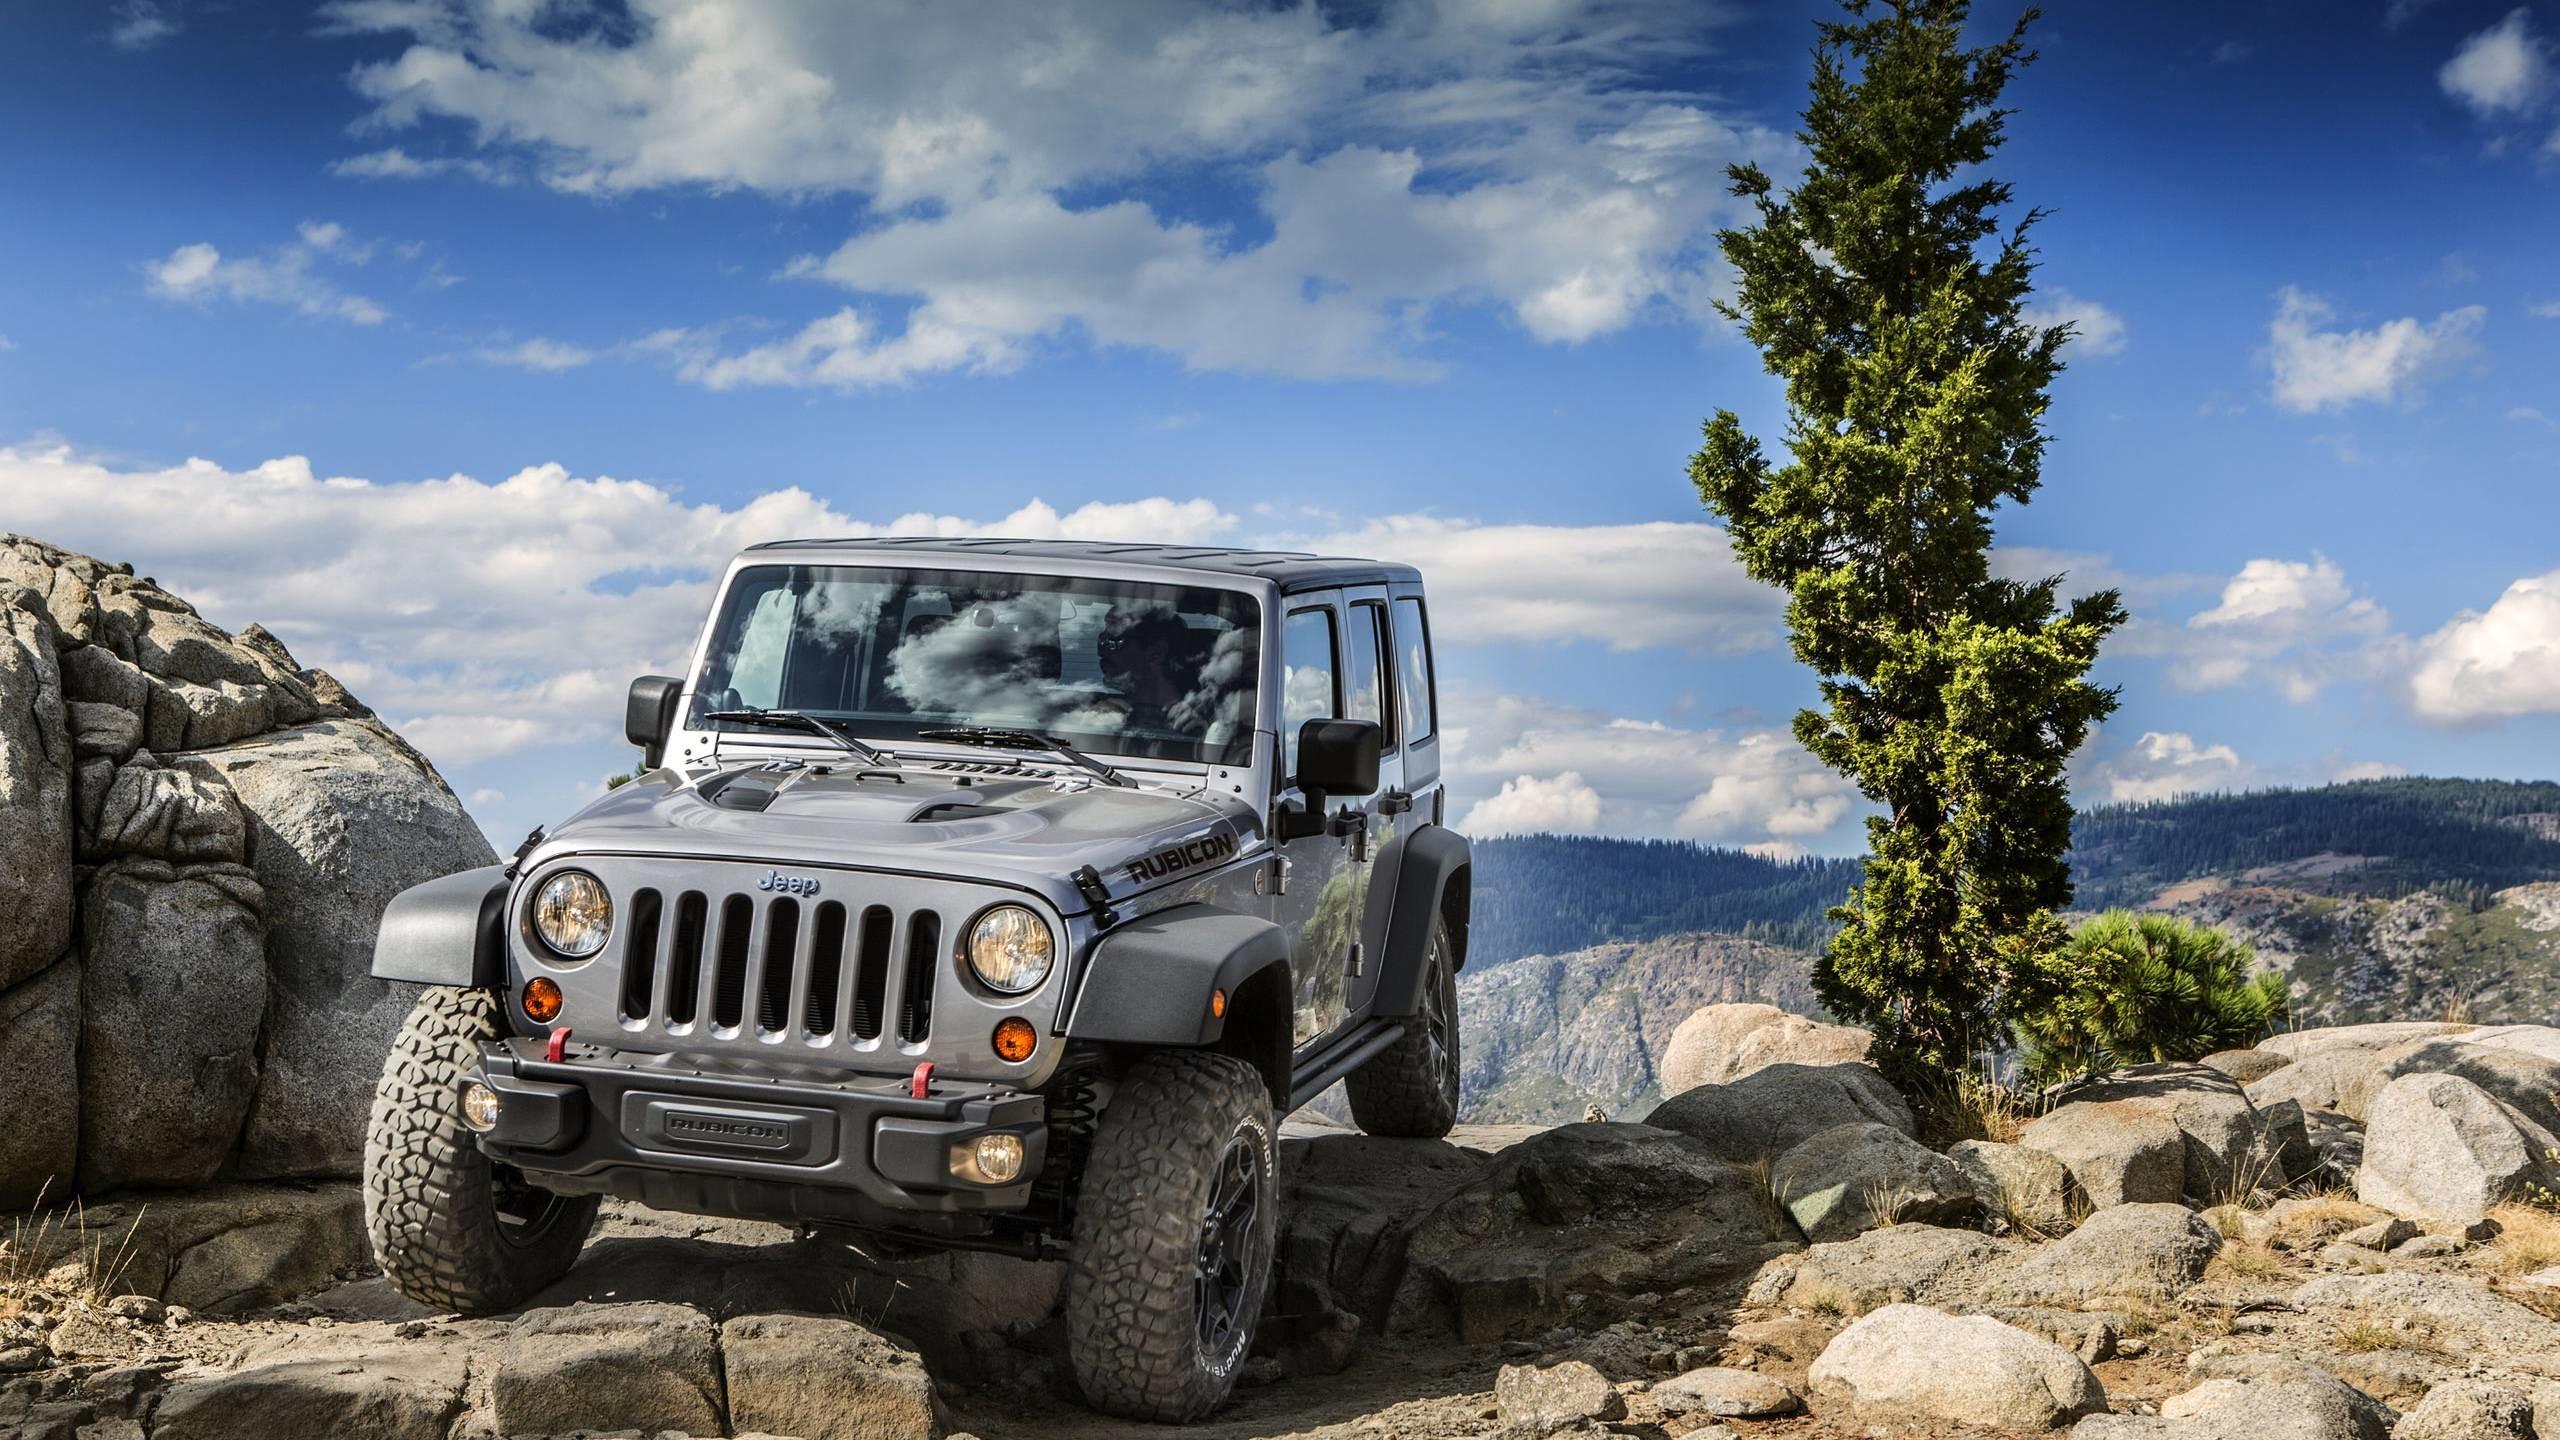 jeep wrangler nature hd wide wallpaper 65136